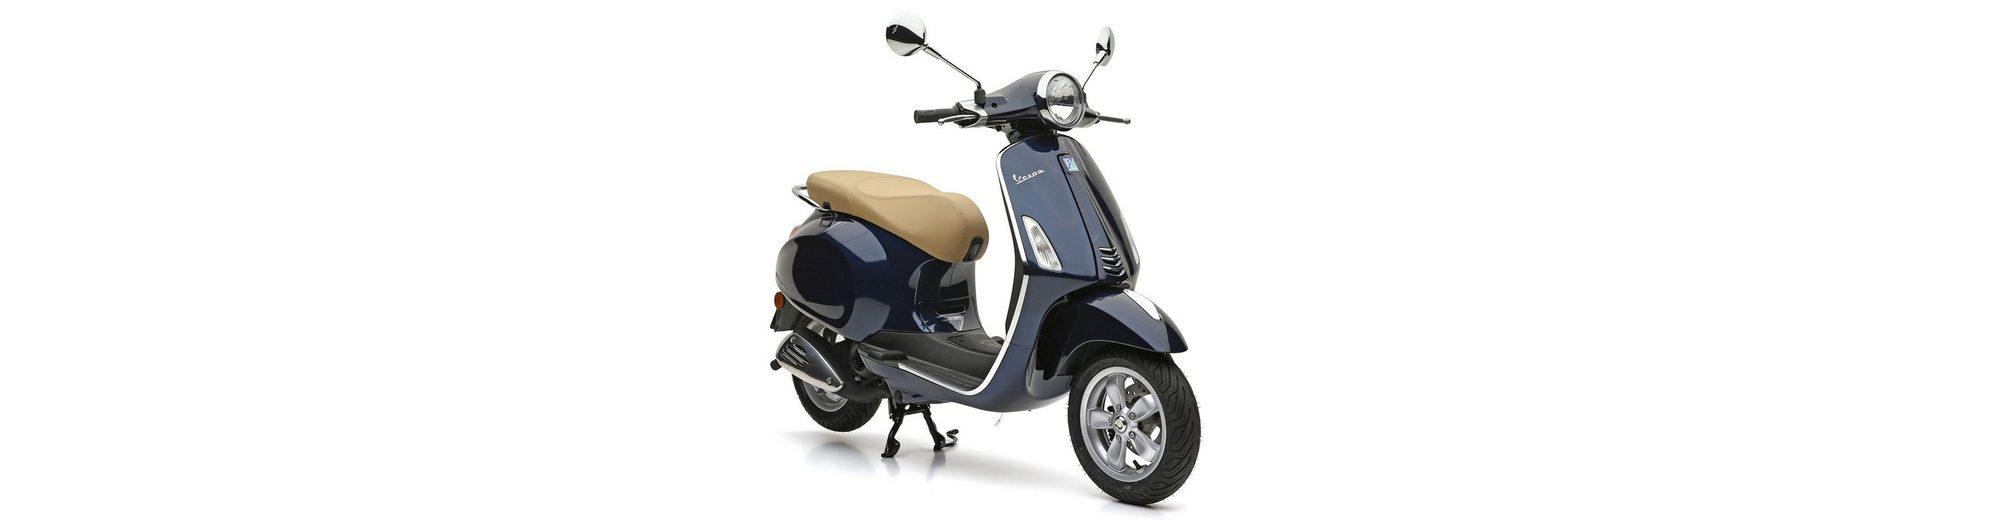 Mofaroller, 49 ccm, 4,35 PS, 25 km/h, dunkelblau, »Primavera«, Vespa